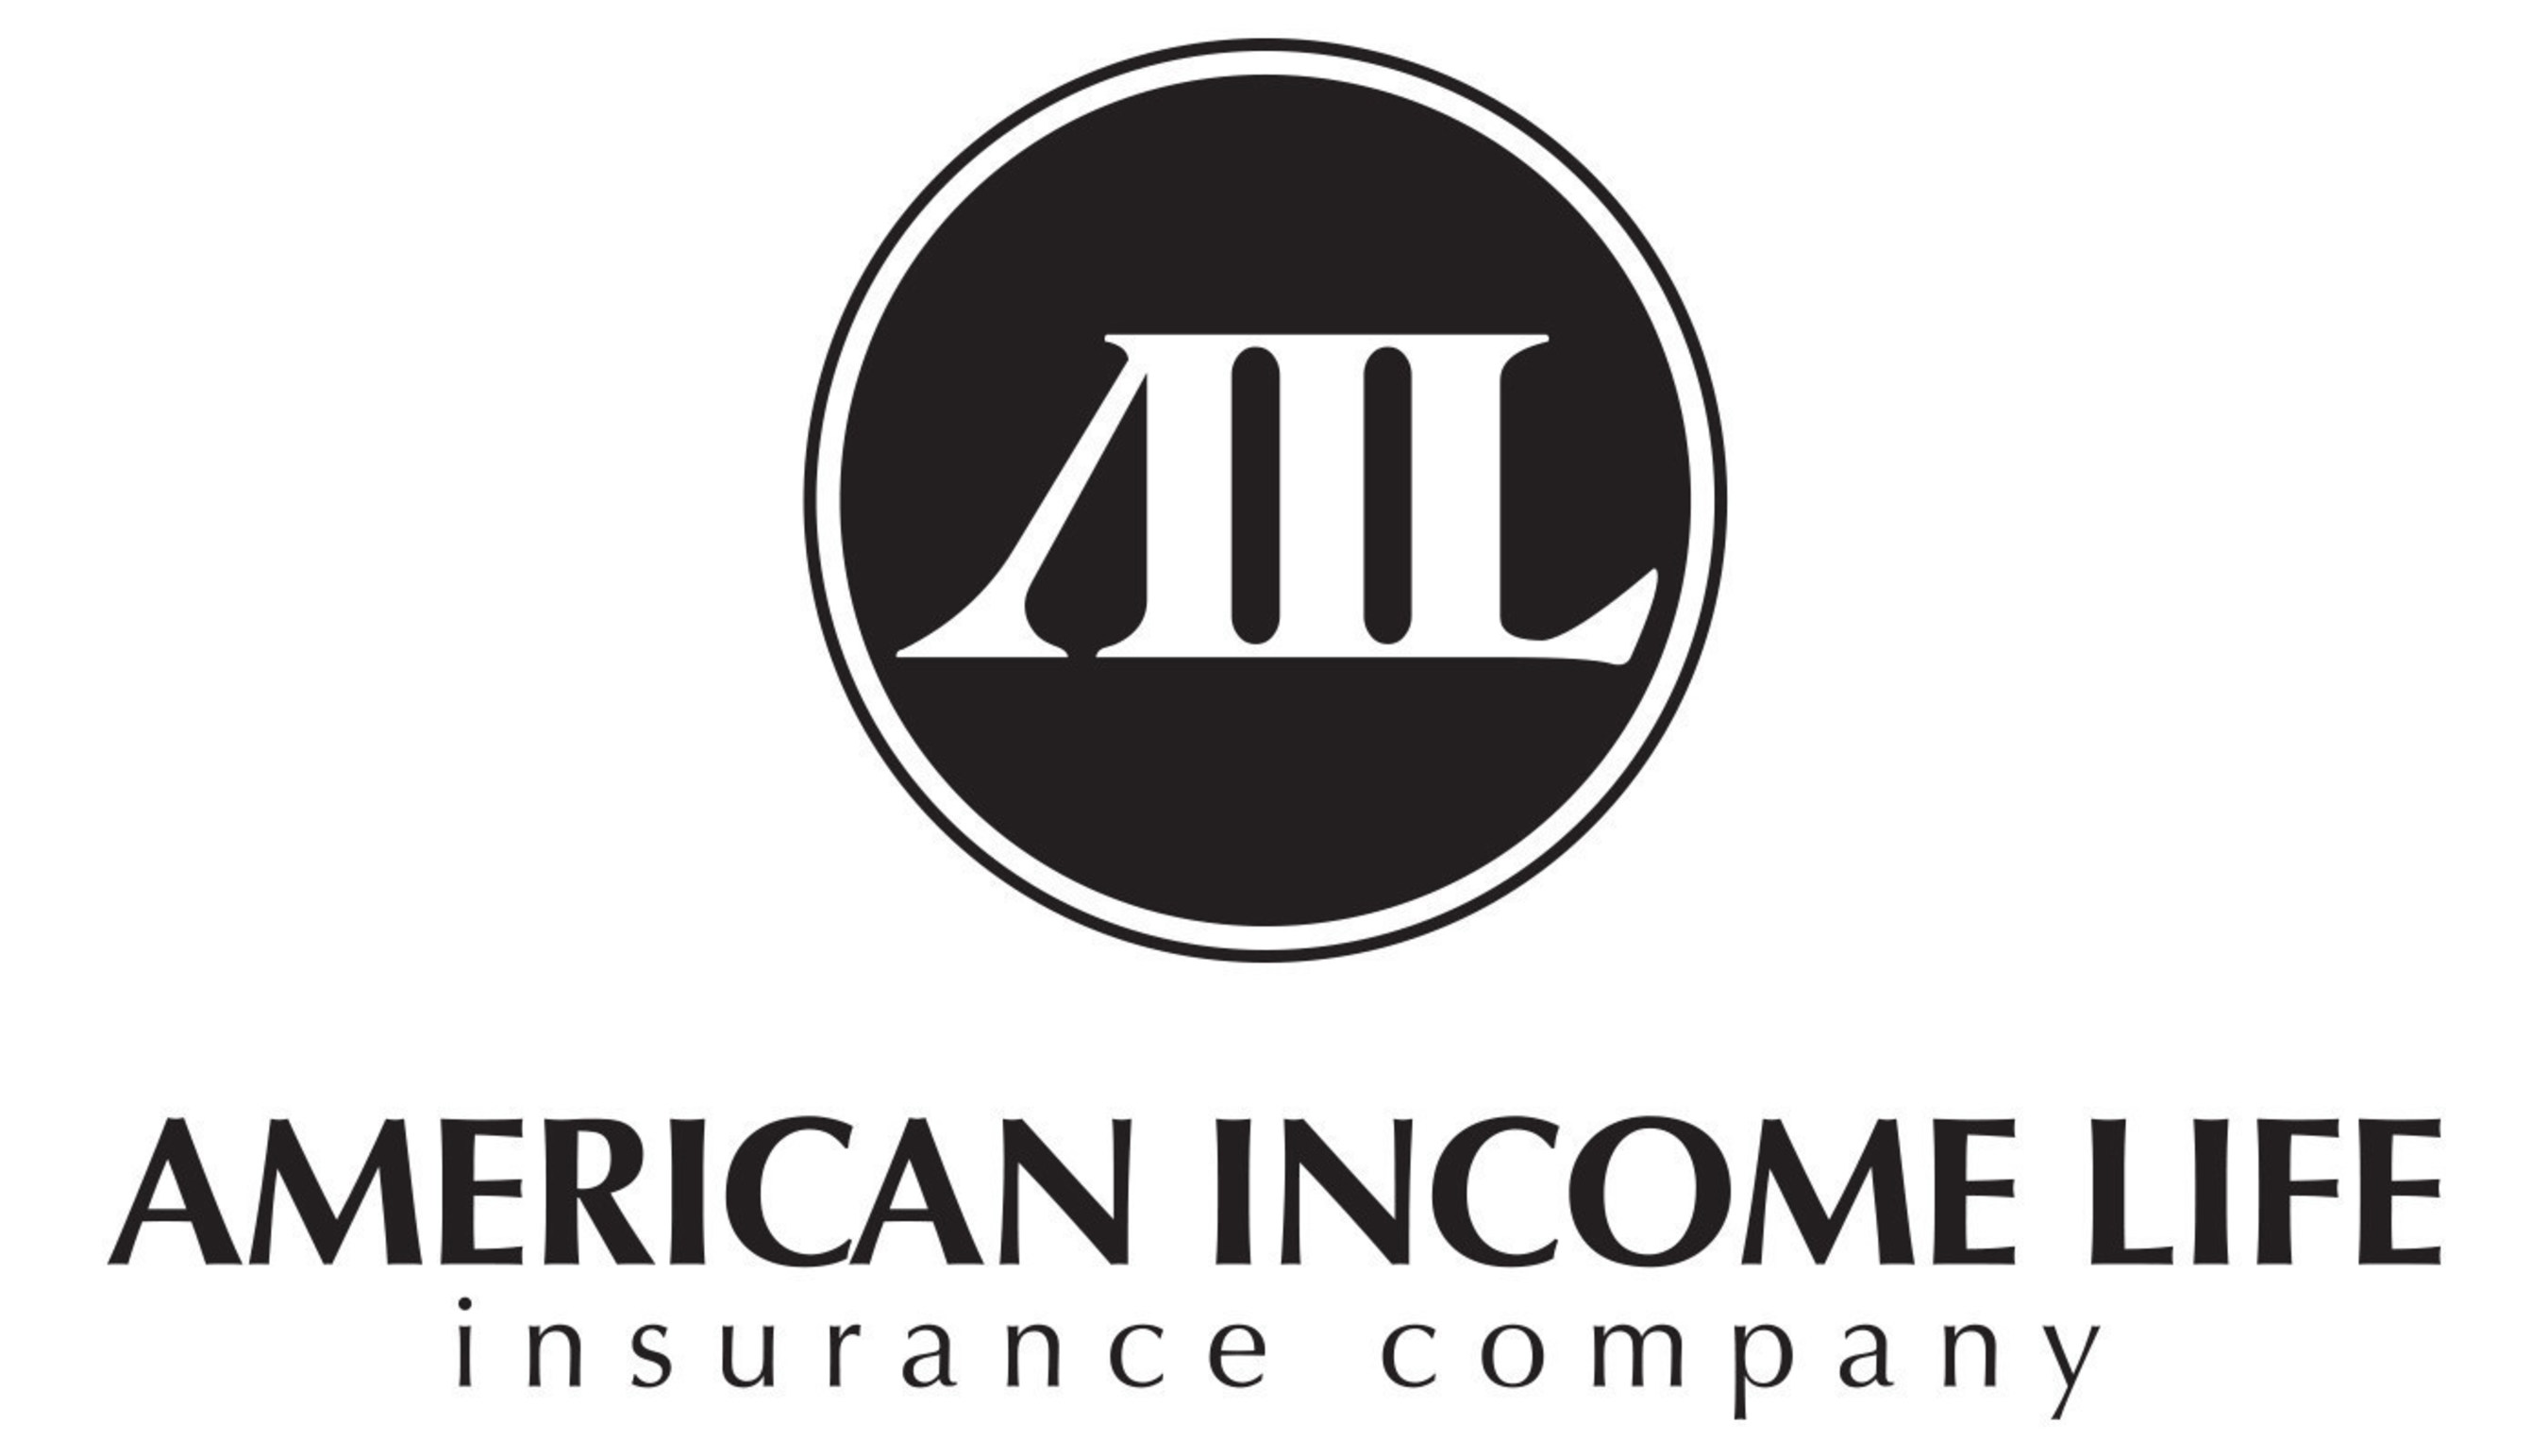 American Income Life Insurance ... logo